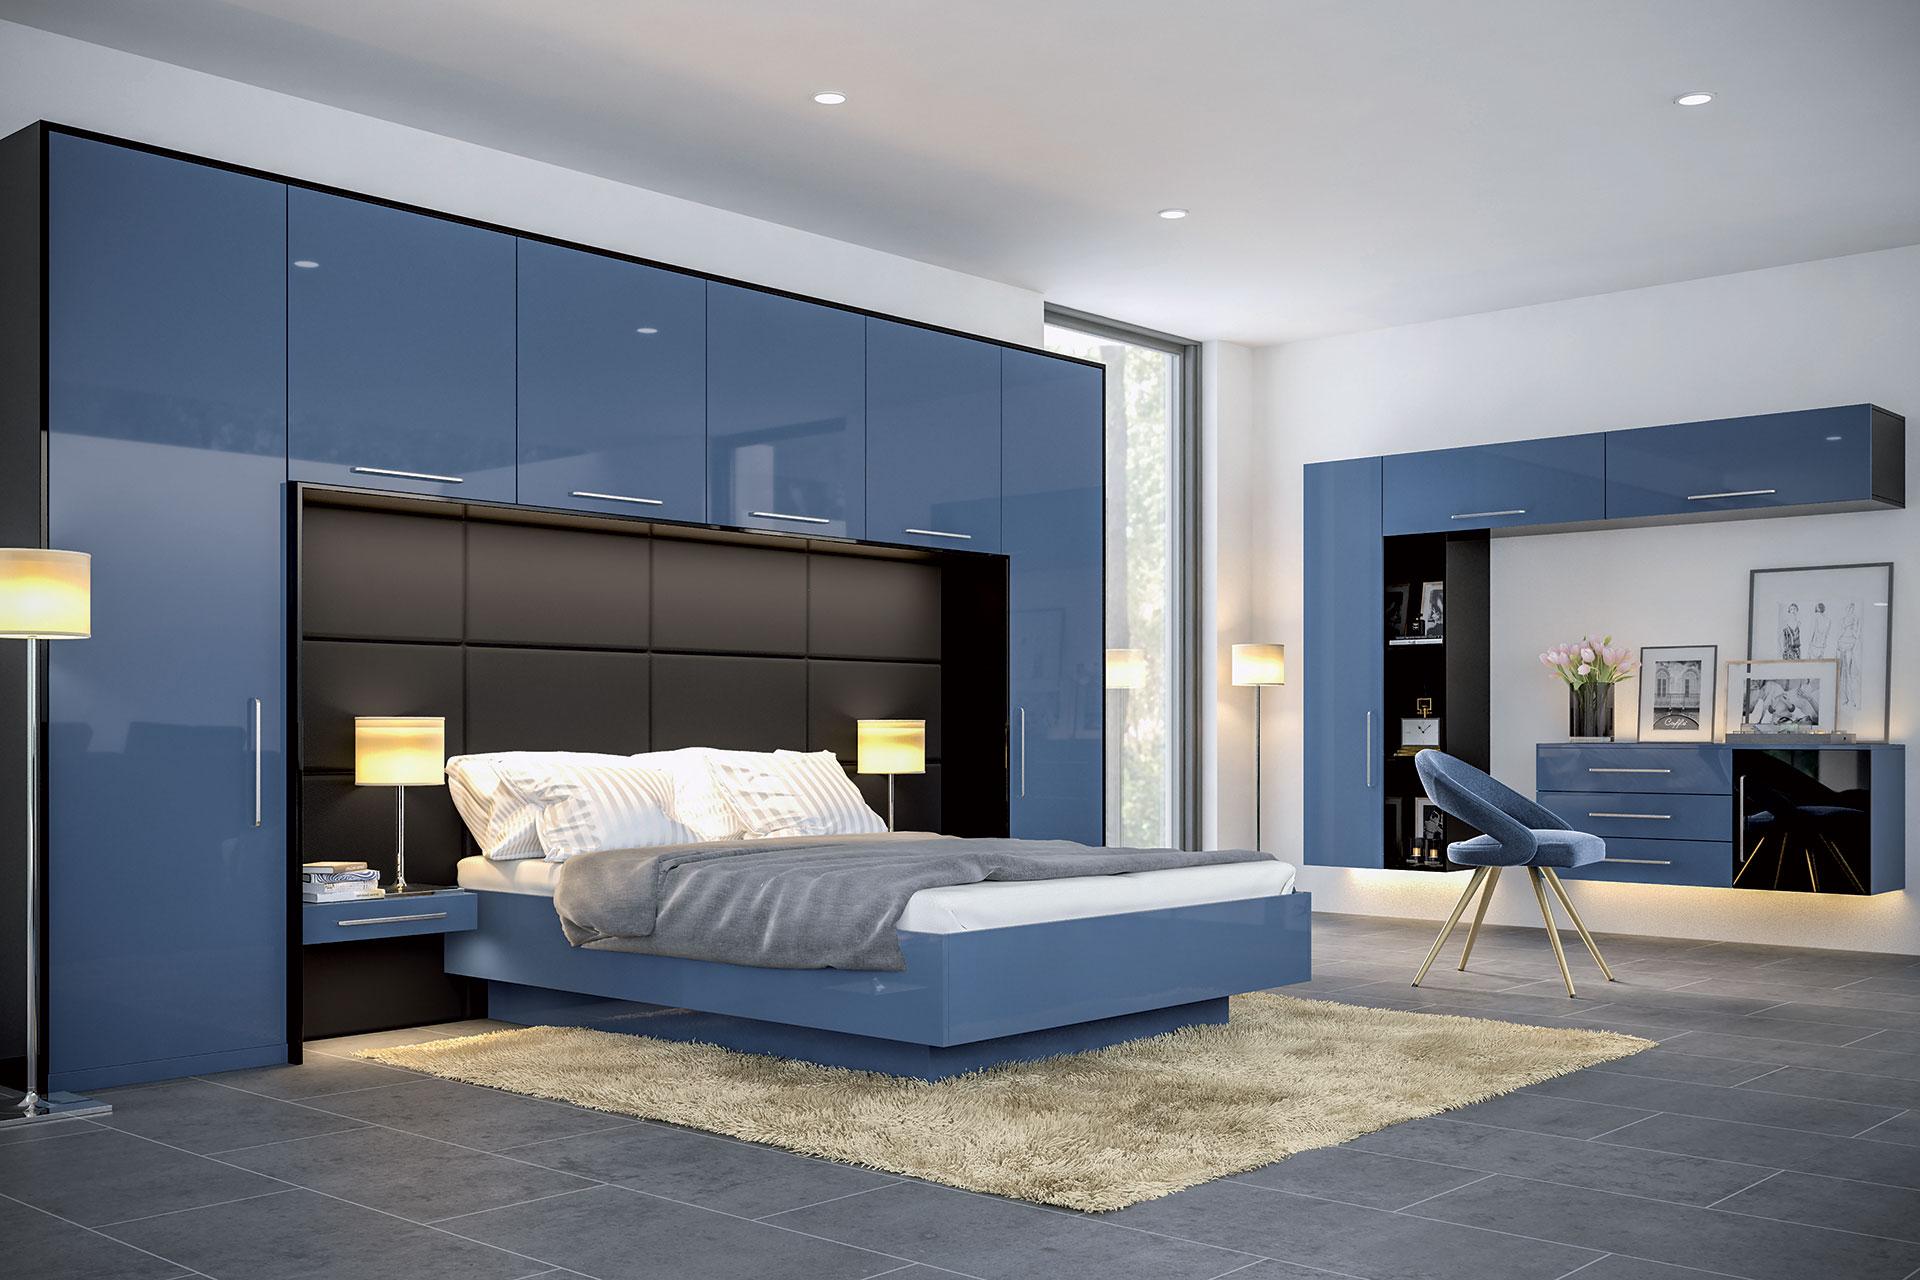 Fabulous Home Kitchens Bedroom Design Kitchen Bedroom Design Download Free Architecture Designs Intelgarnamadebymaigaardcom